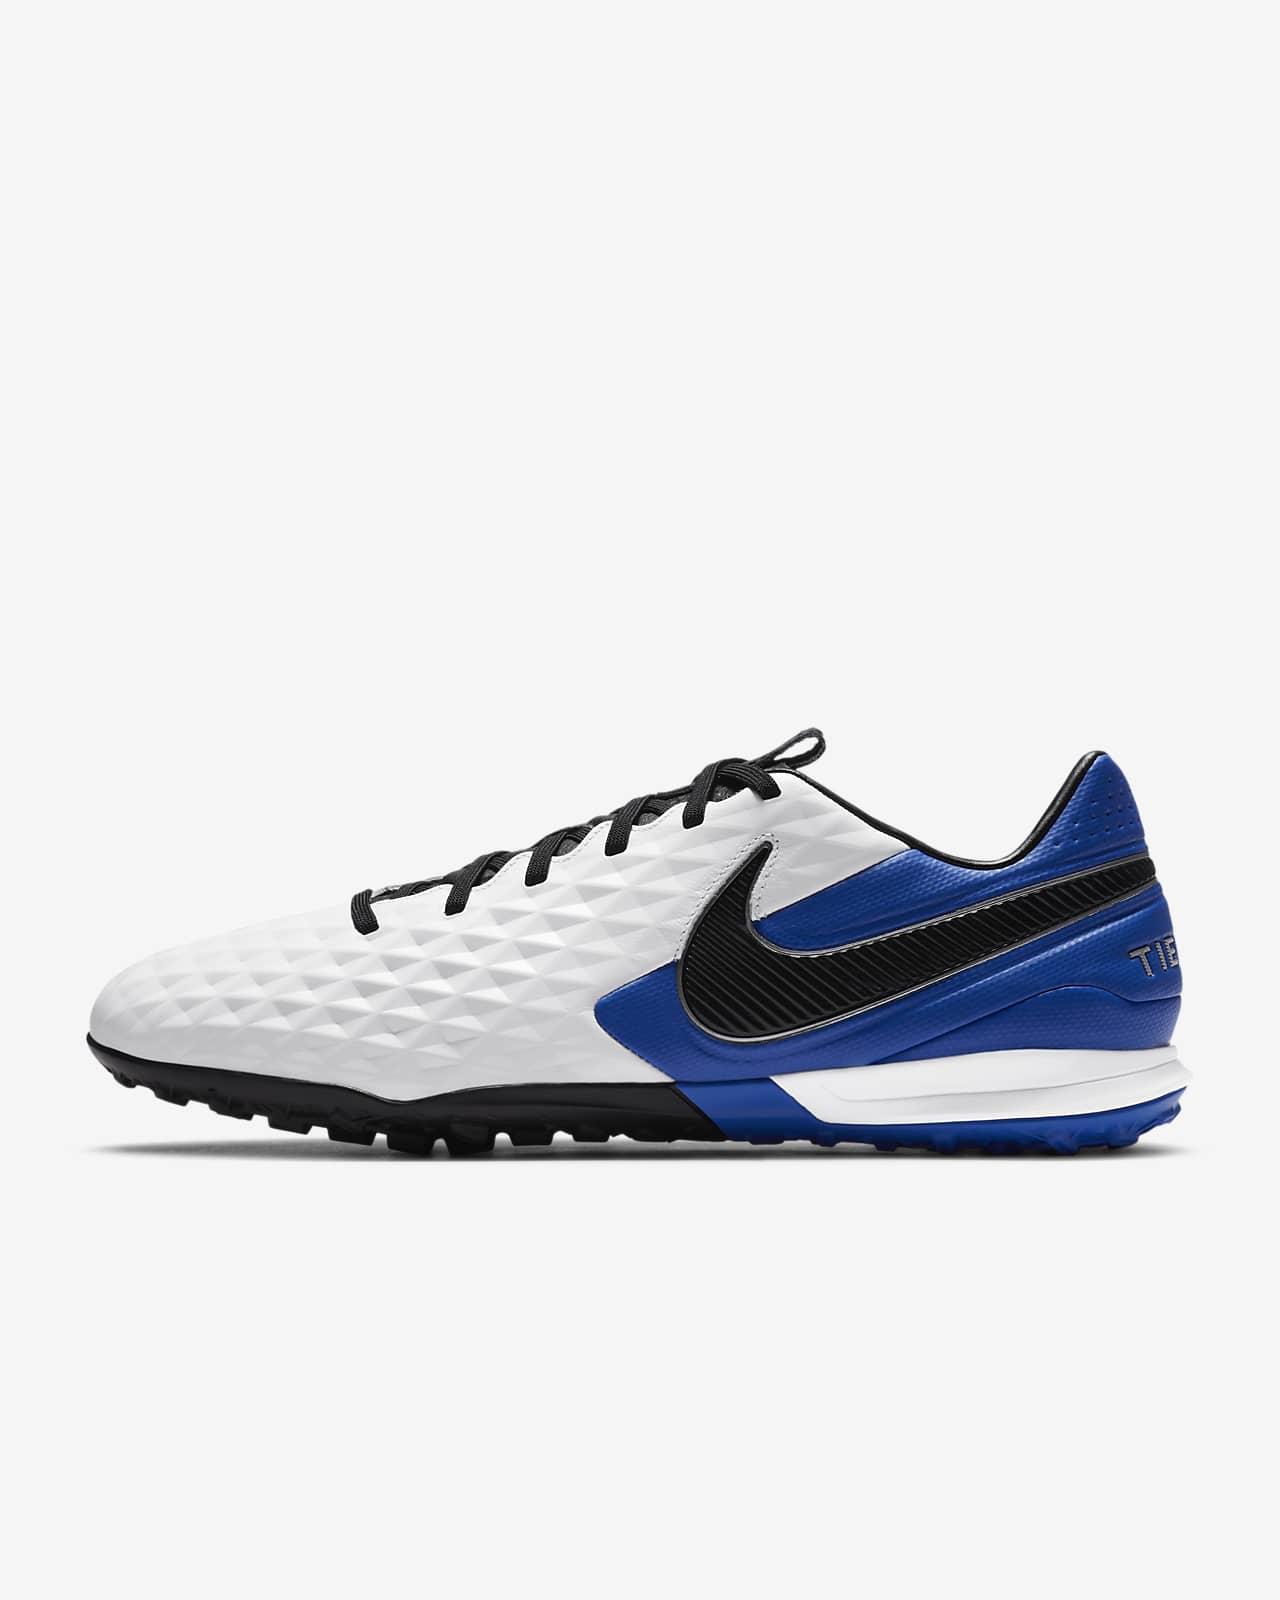 Nike Tiempo Legend 8 Pro TF Voetbalschoen (turf)